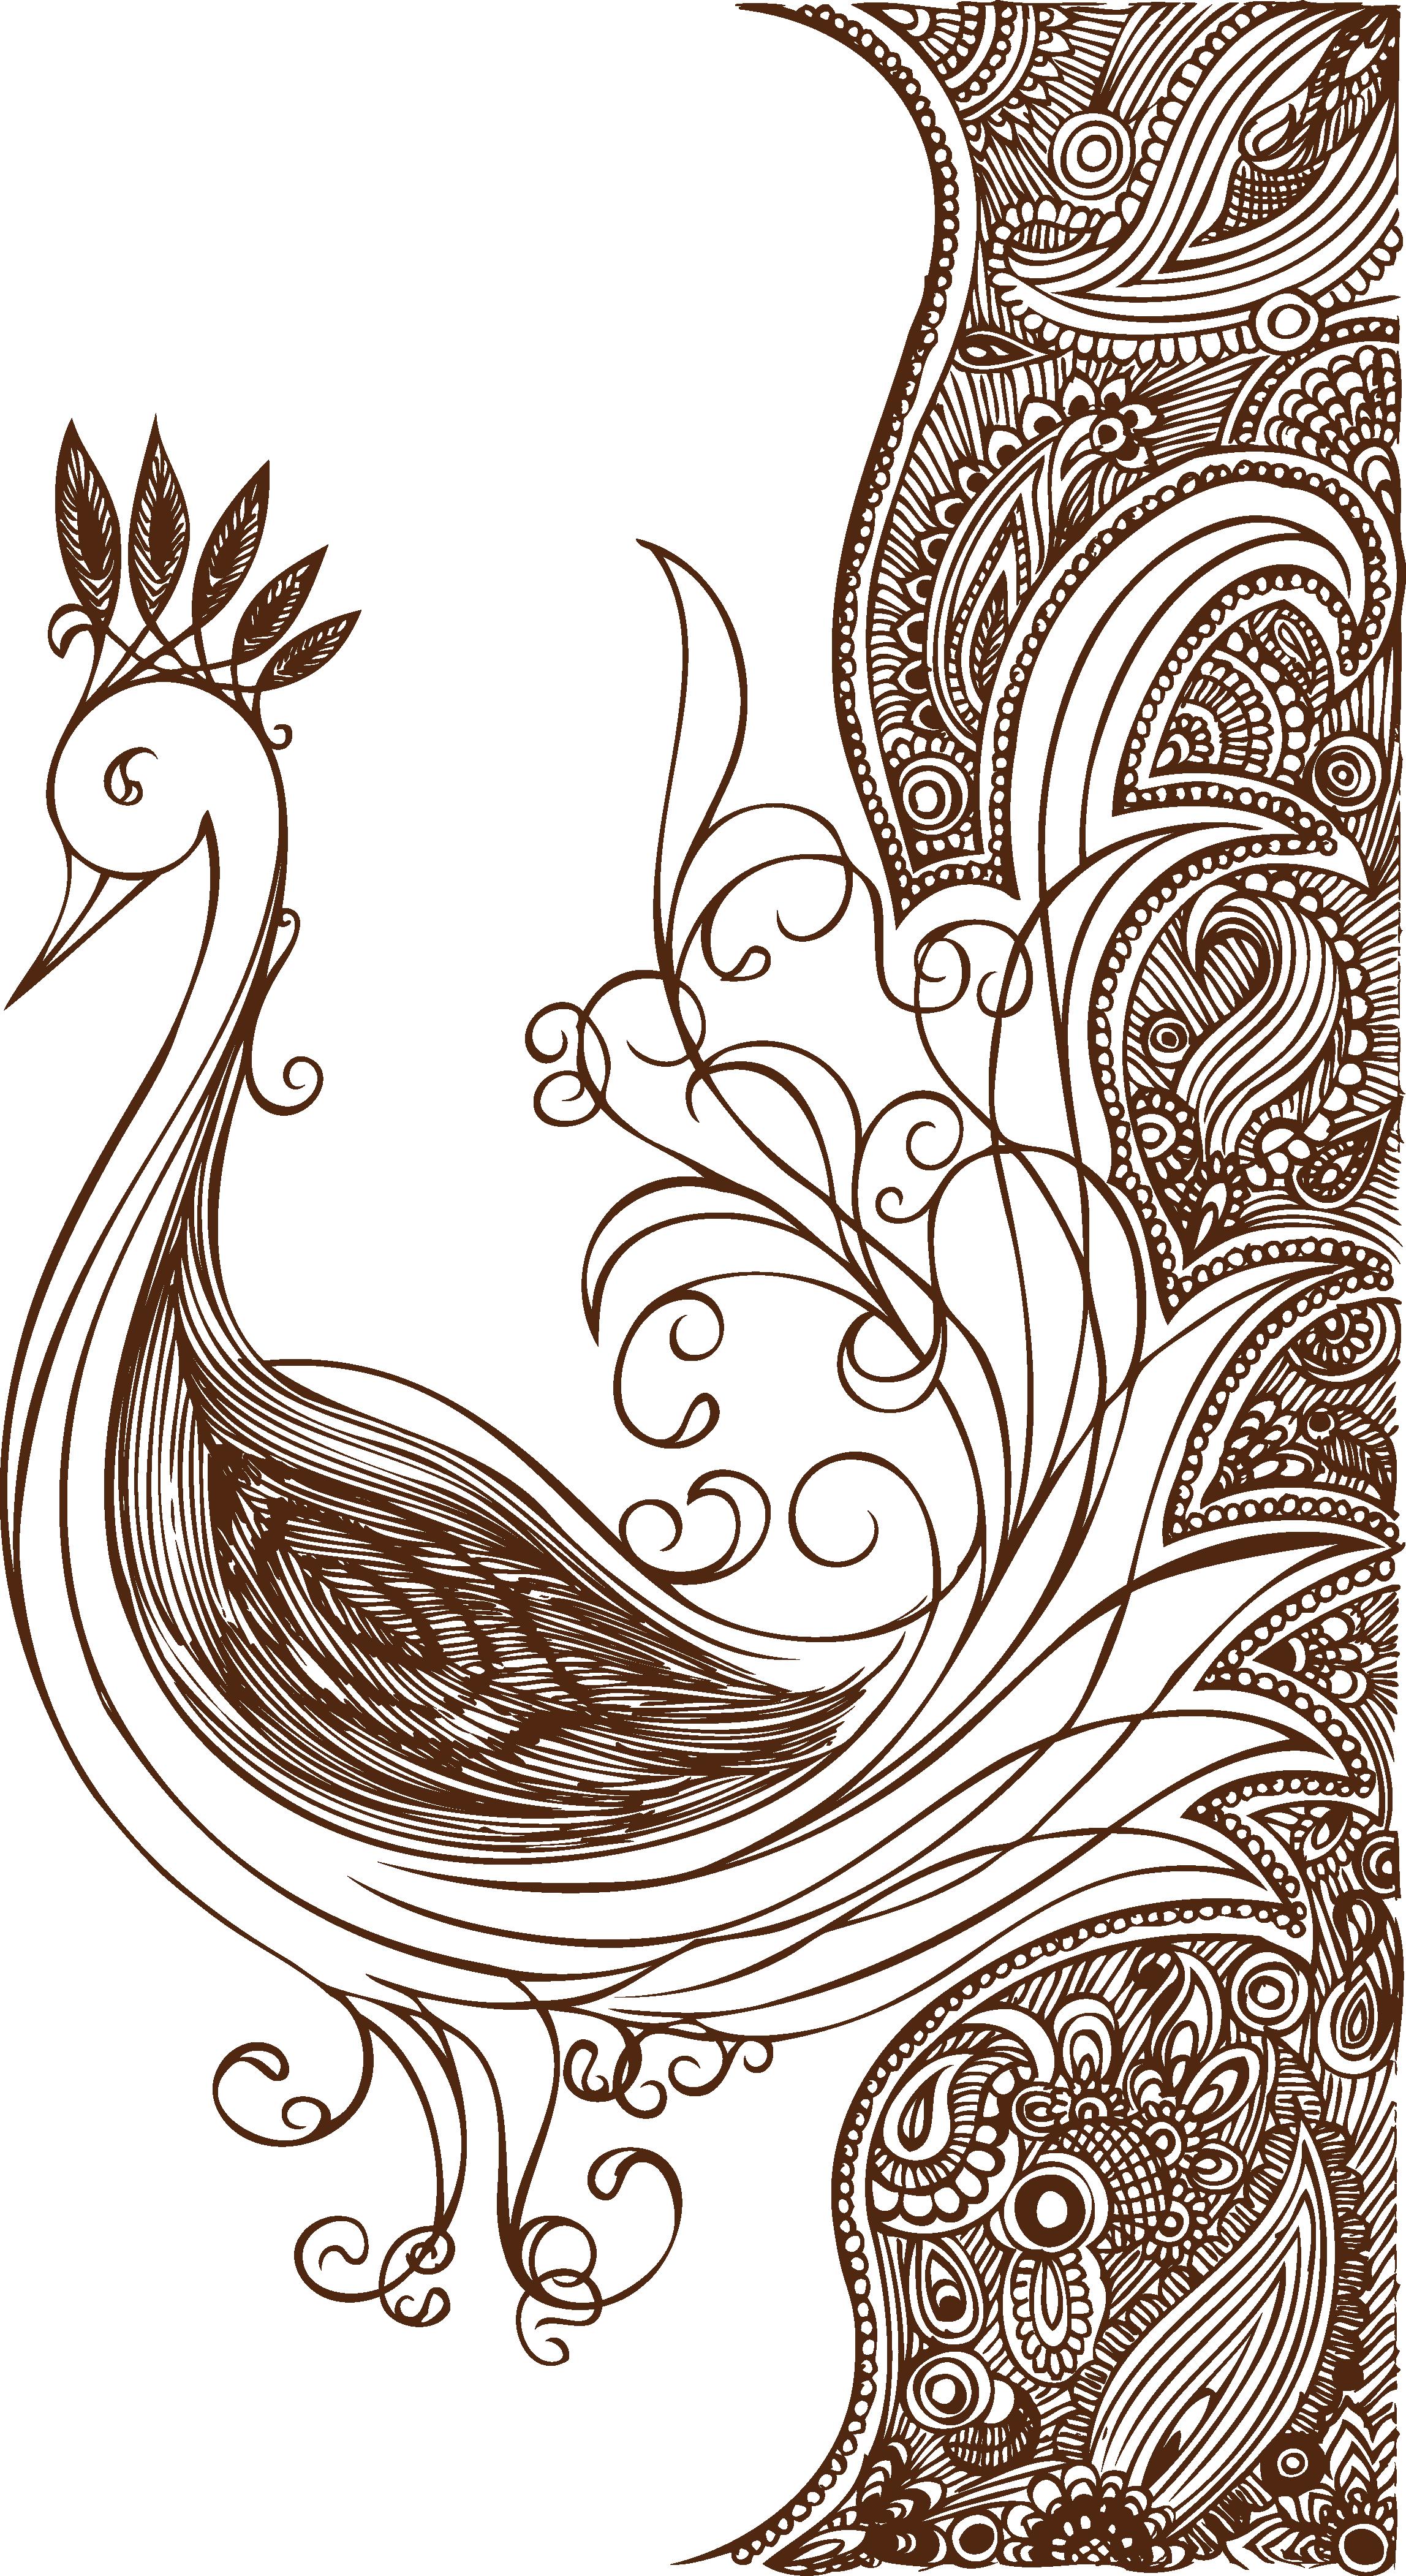 clip art Floral design flower peacock. Drawing peacocks line